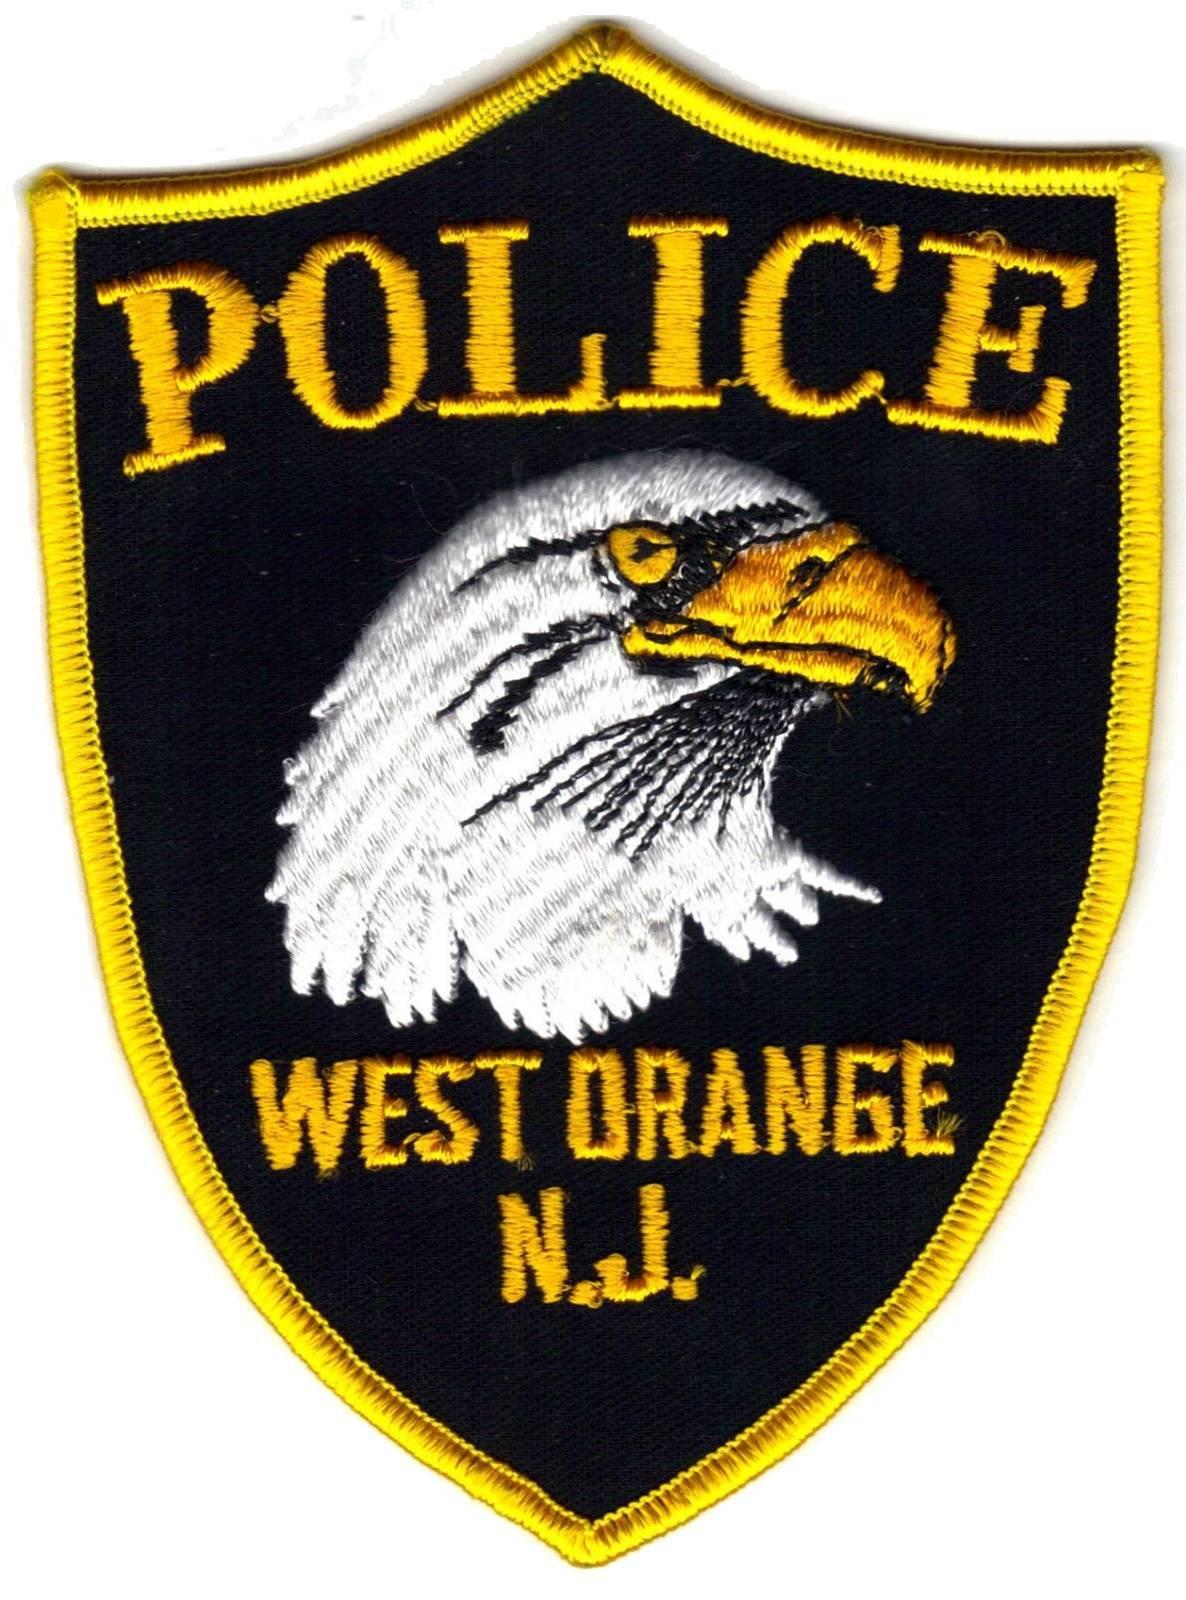 c7c7cdb4526a7e3de765_best_1e2d0272938706939989_West_Orange_Police_Patch.jpg